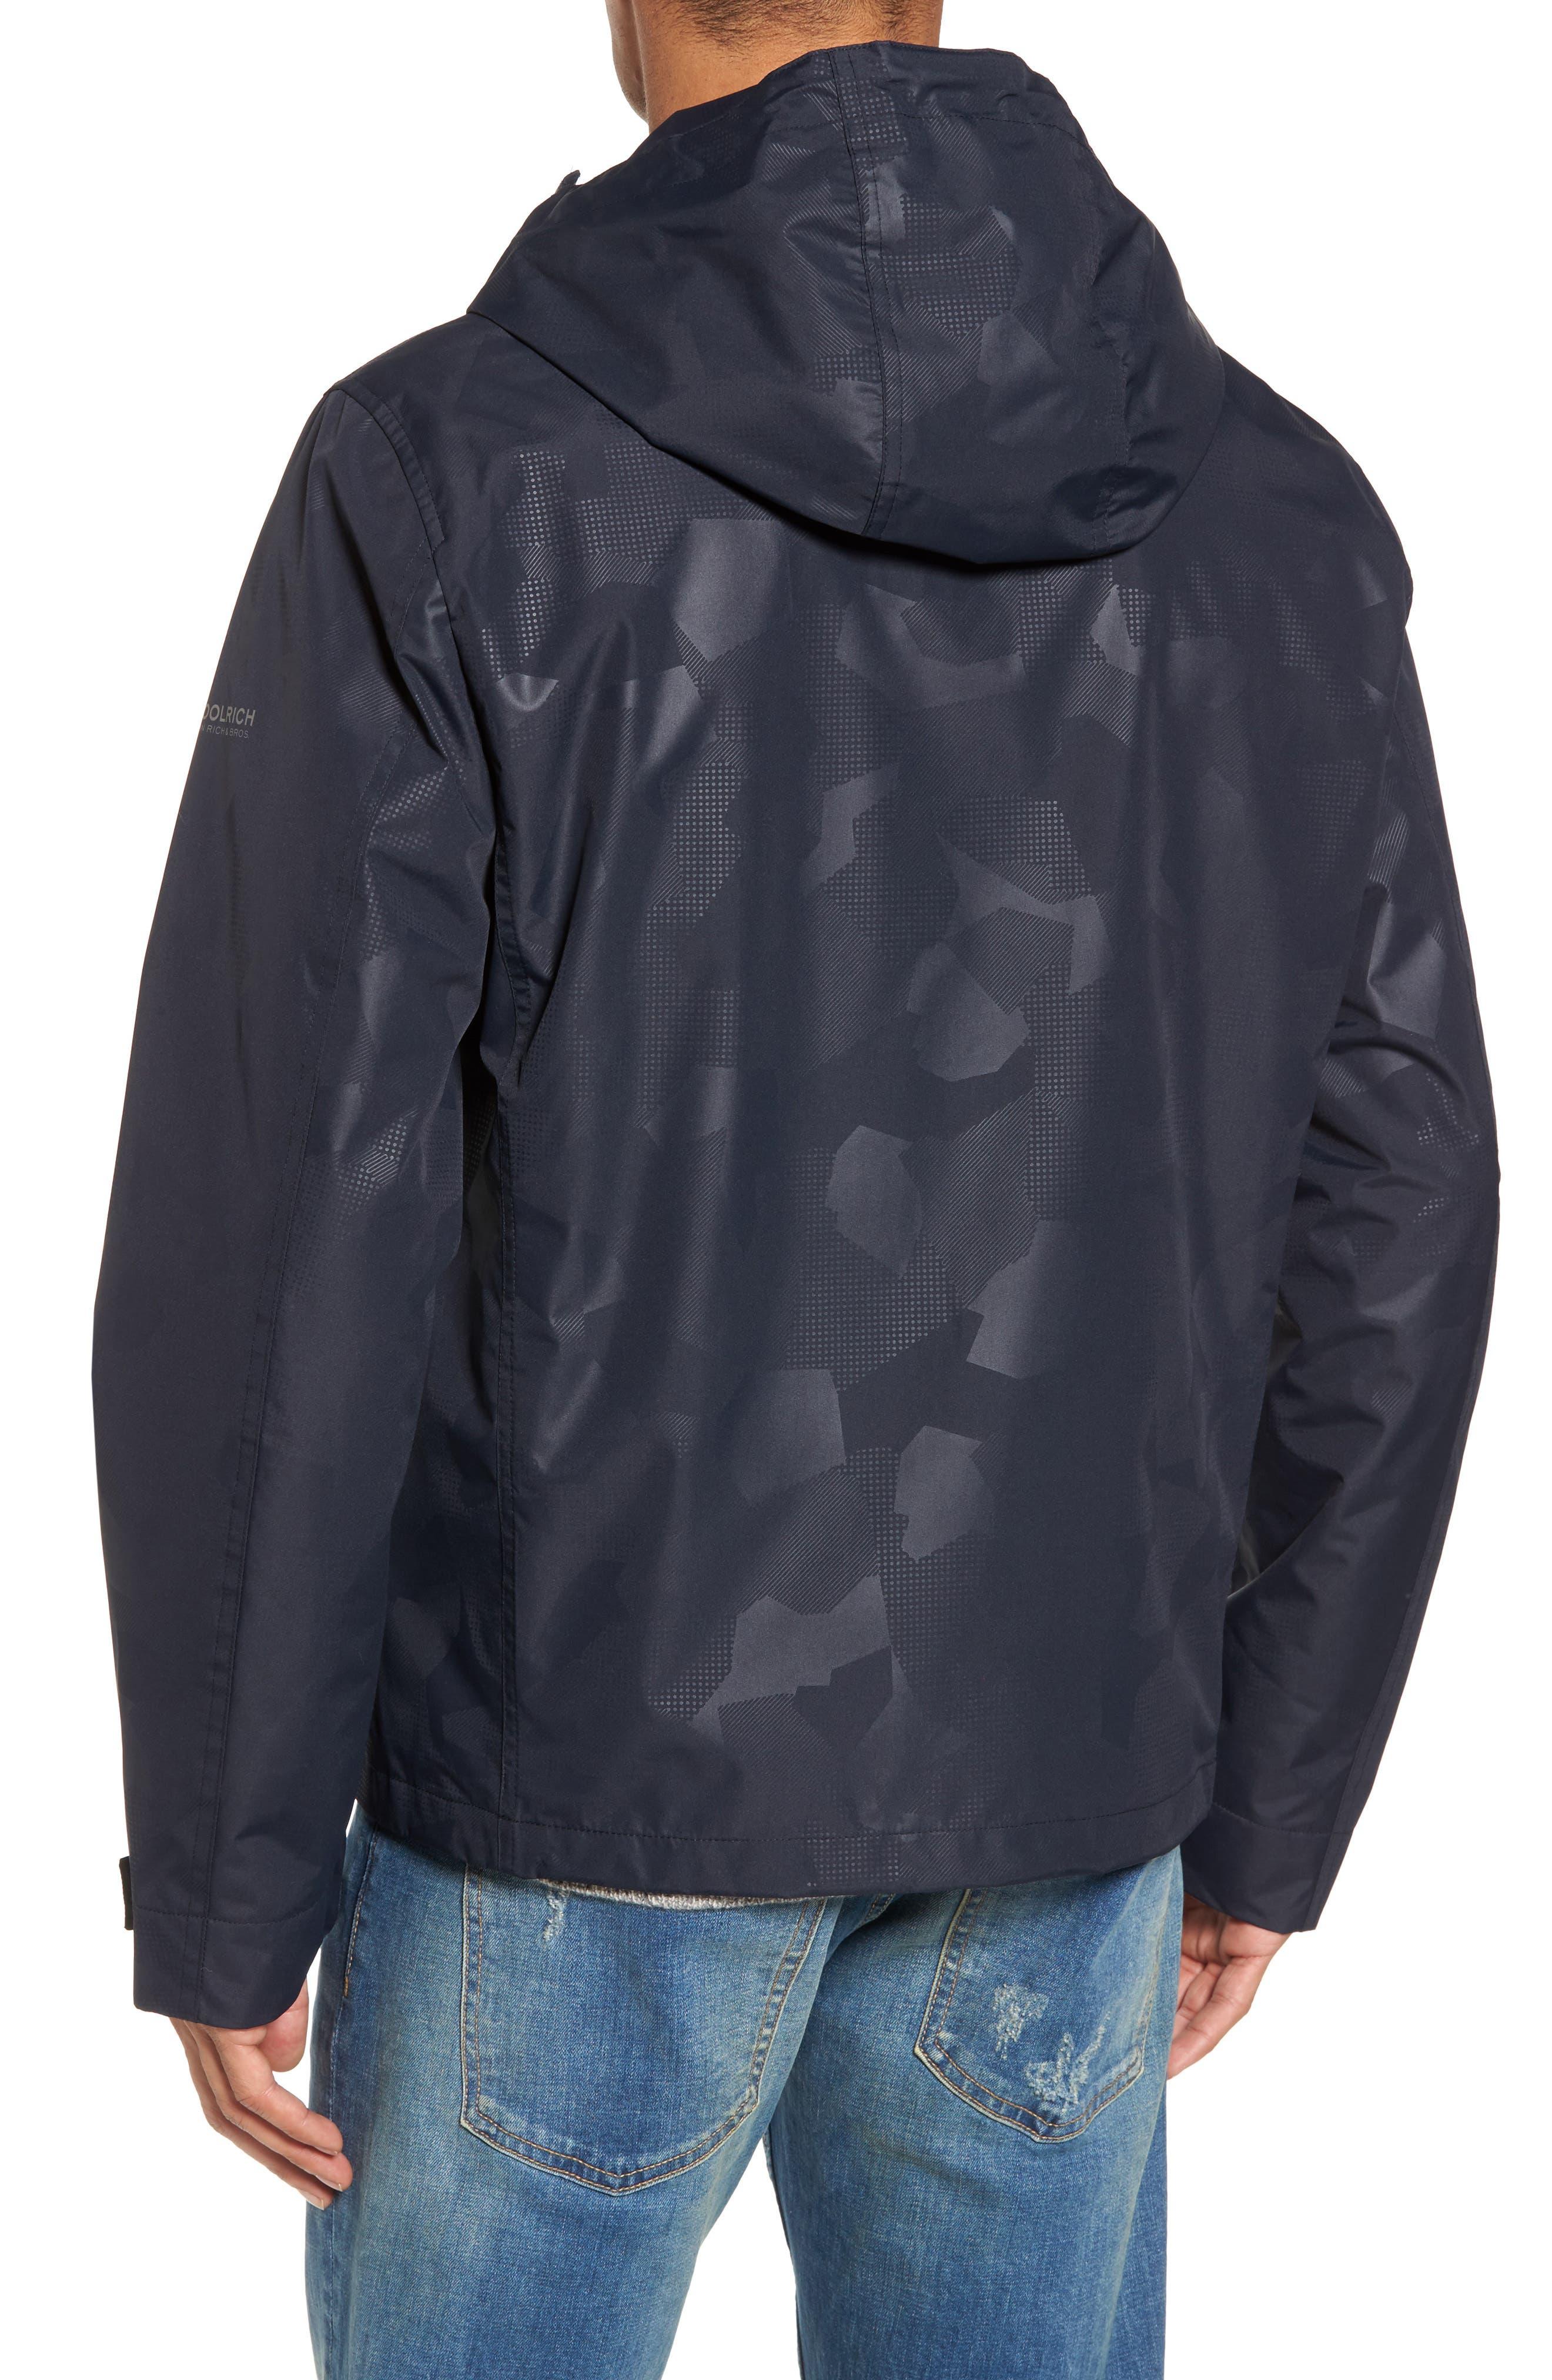 John Rich & Bros. Atlantic Camo Hooded Jacket,                             Alternate thumbnail 2, color,                             Melton Blue Camo